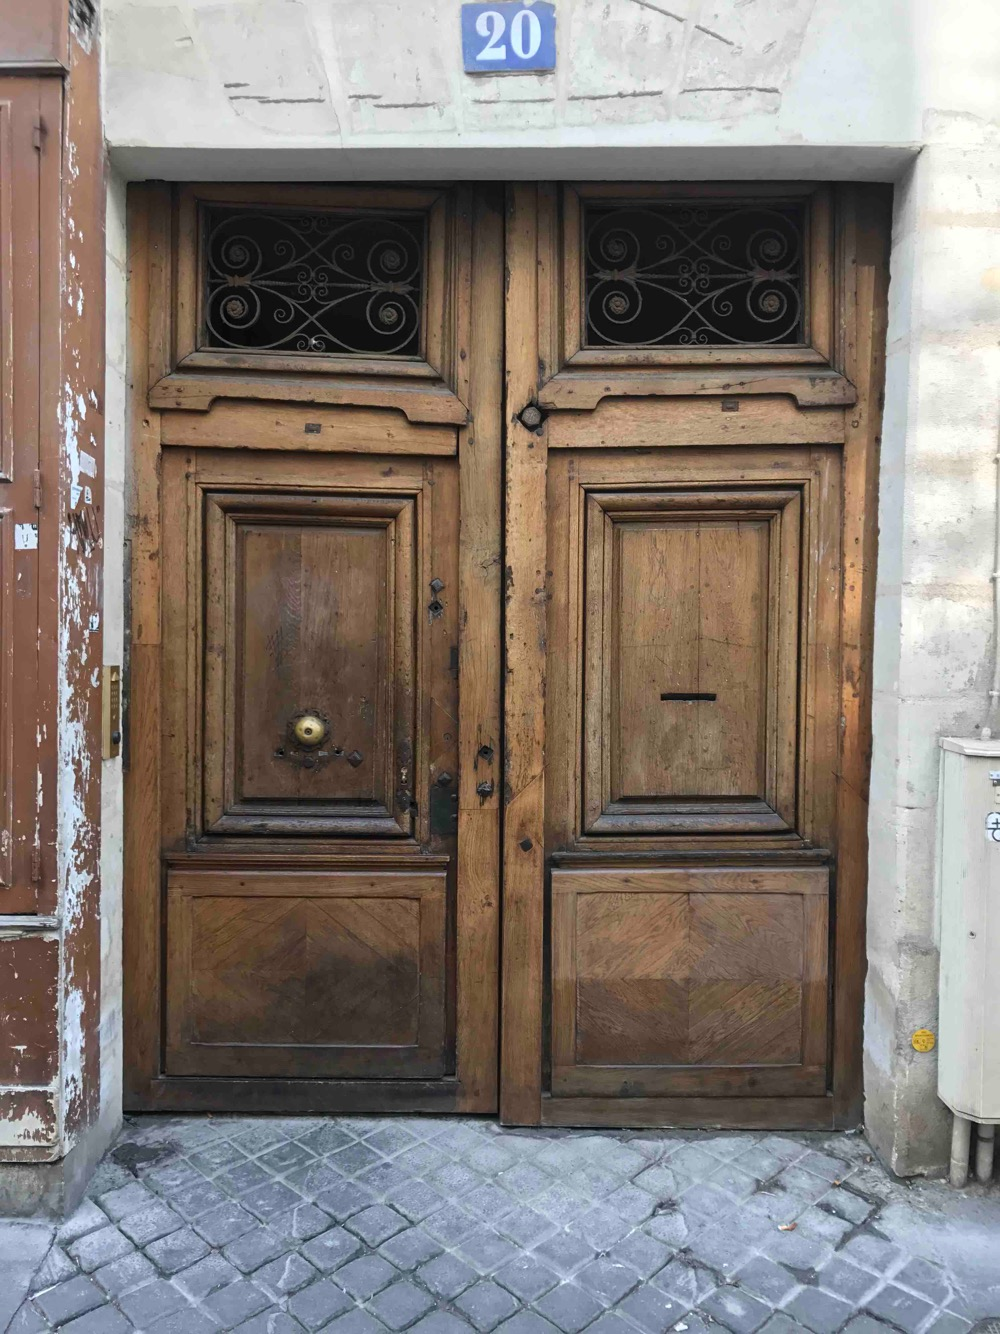 20 RUE CHARLOT PARIS 3